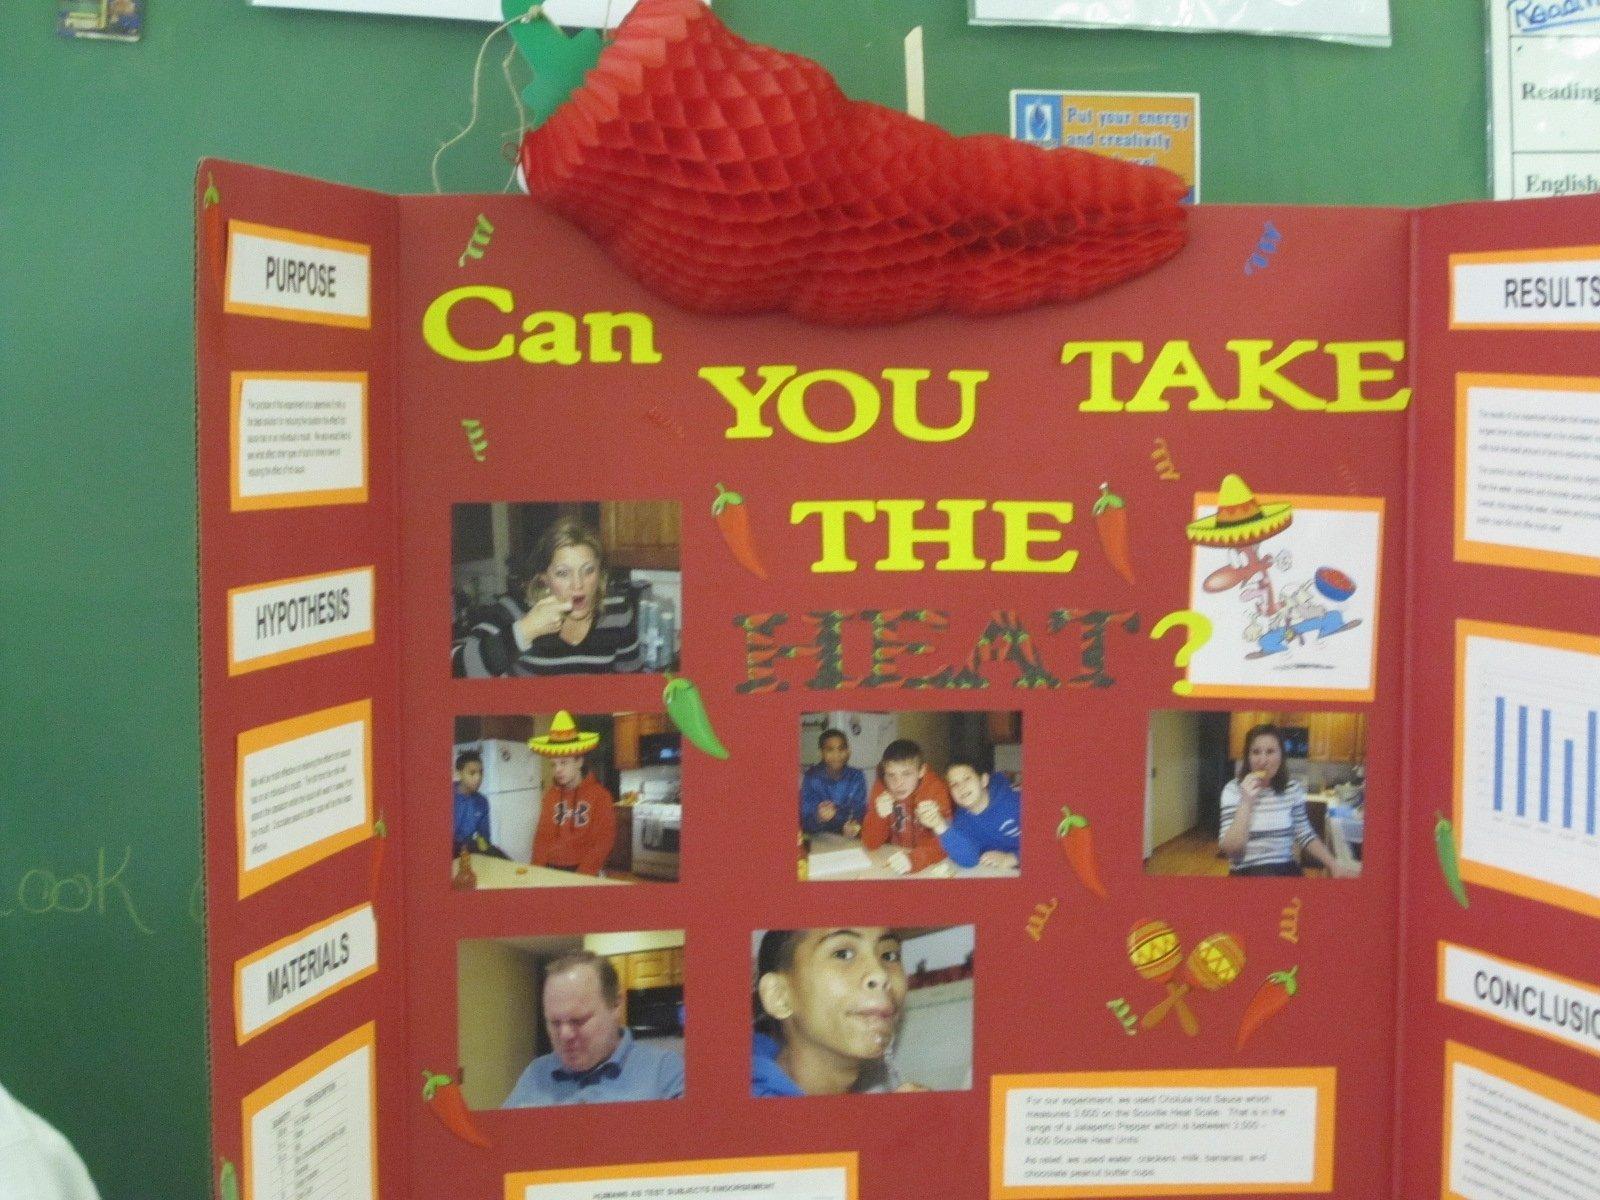 10 Beautiful 8Th Grade Science Fair Project Ideas easy 7th grade science fair projects research paper writing service 2020